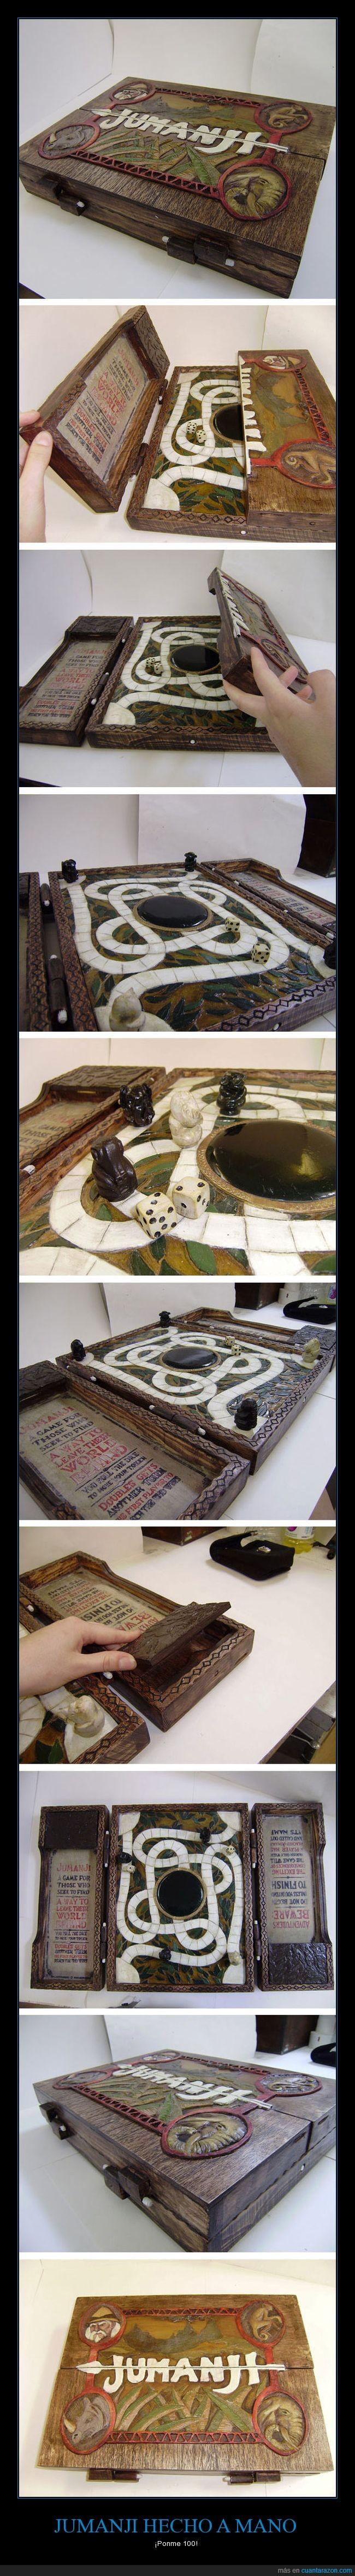 artesanal,juego,jumanji,manual